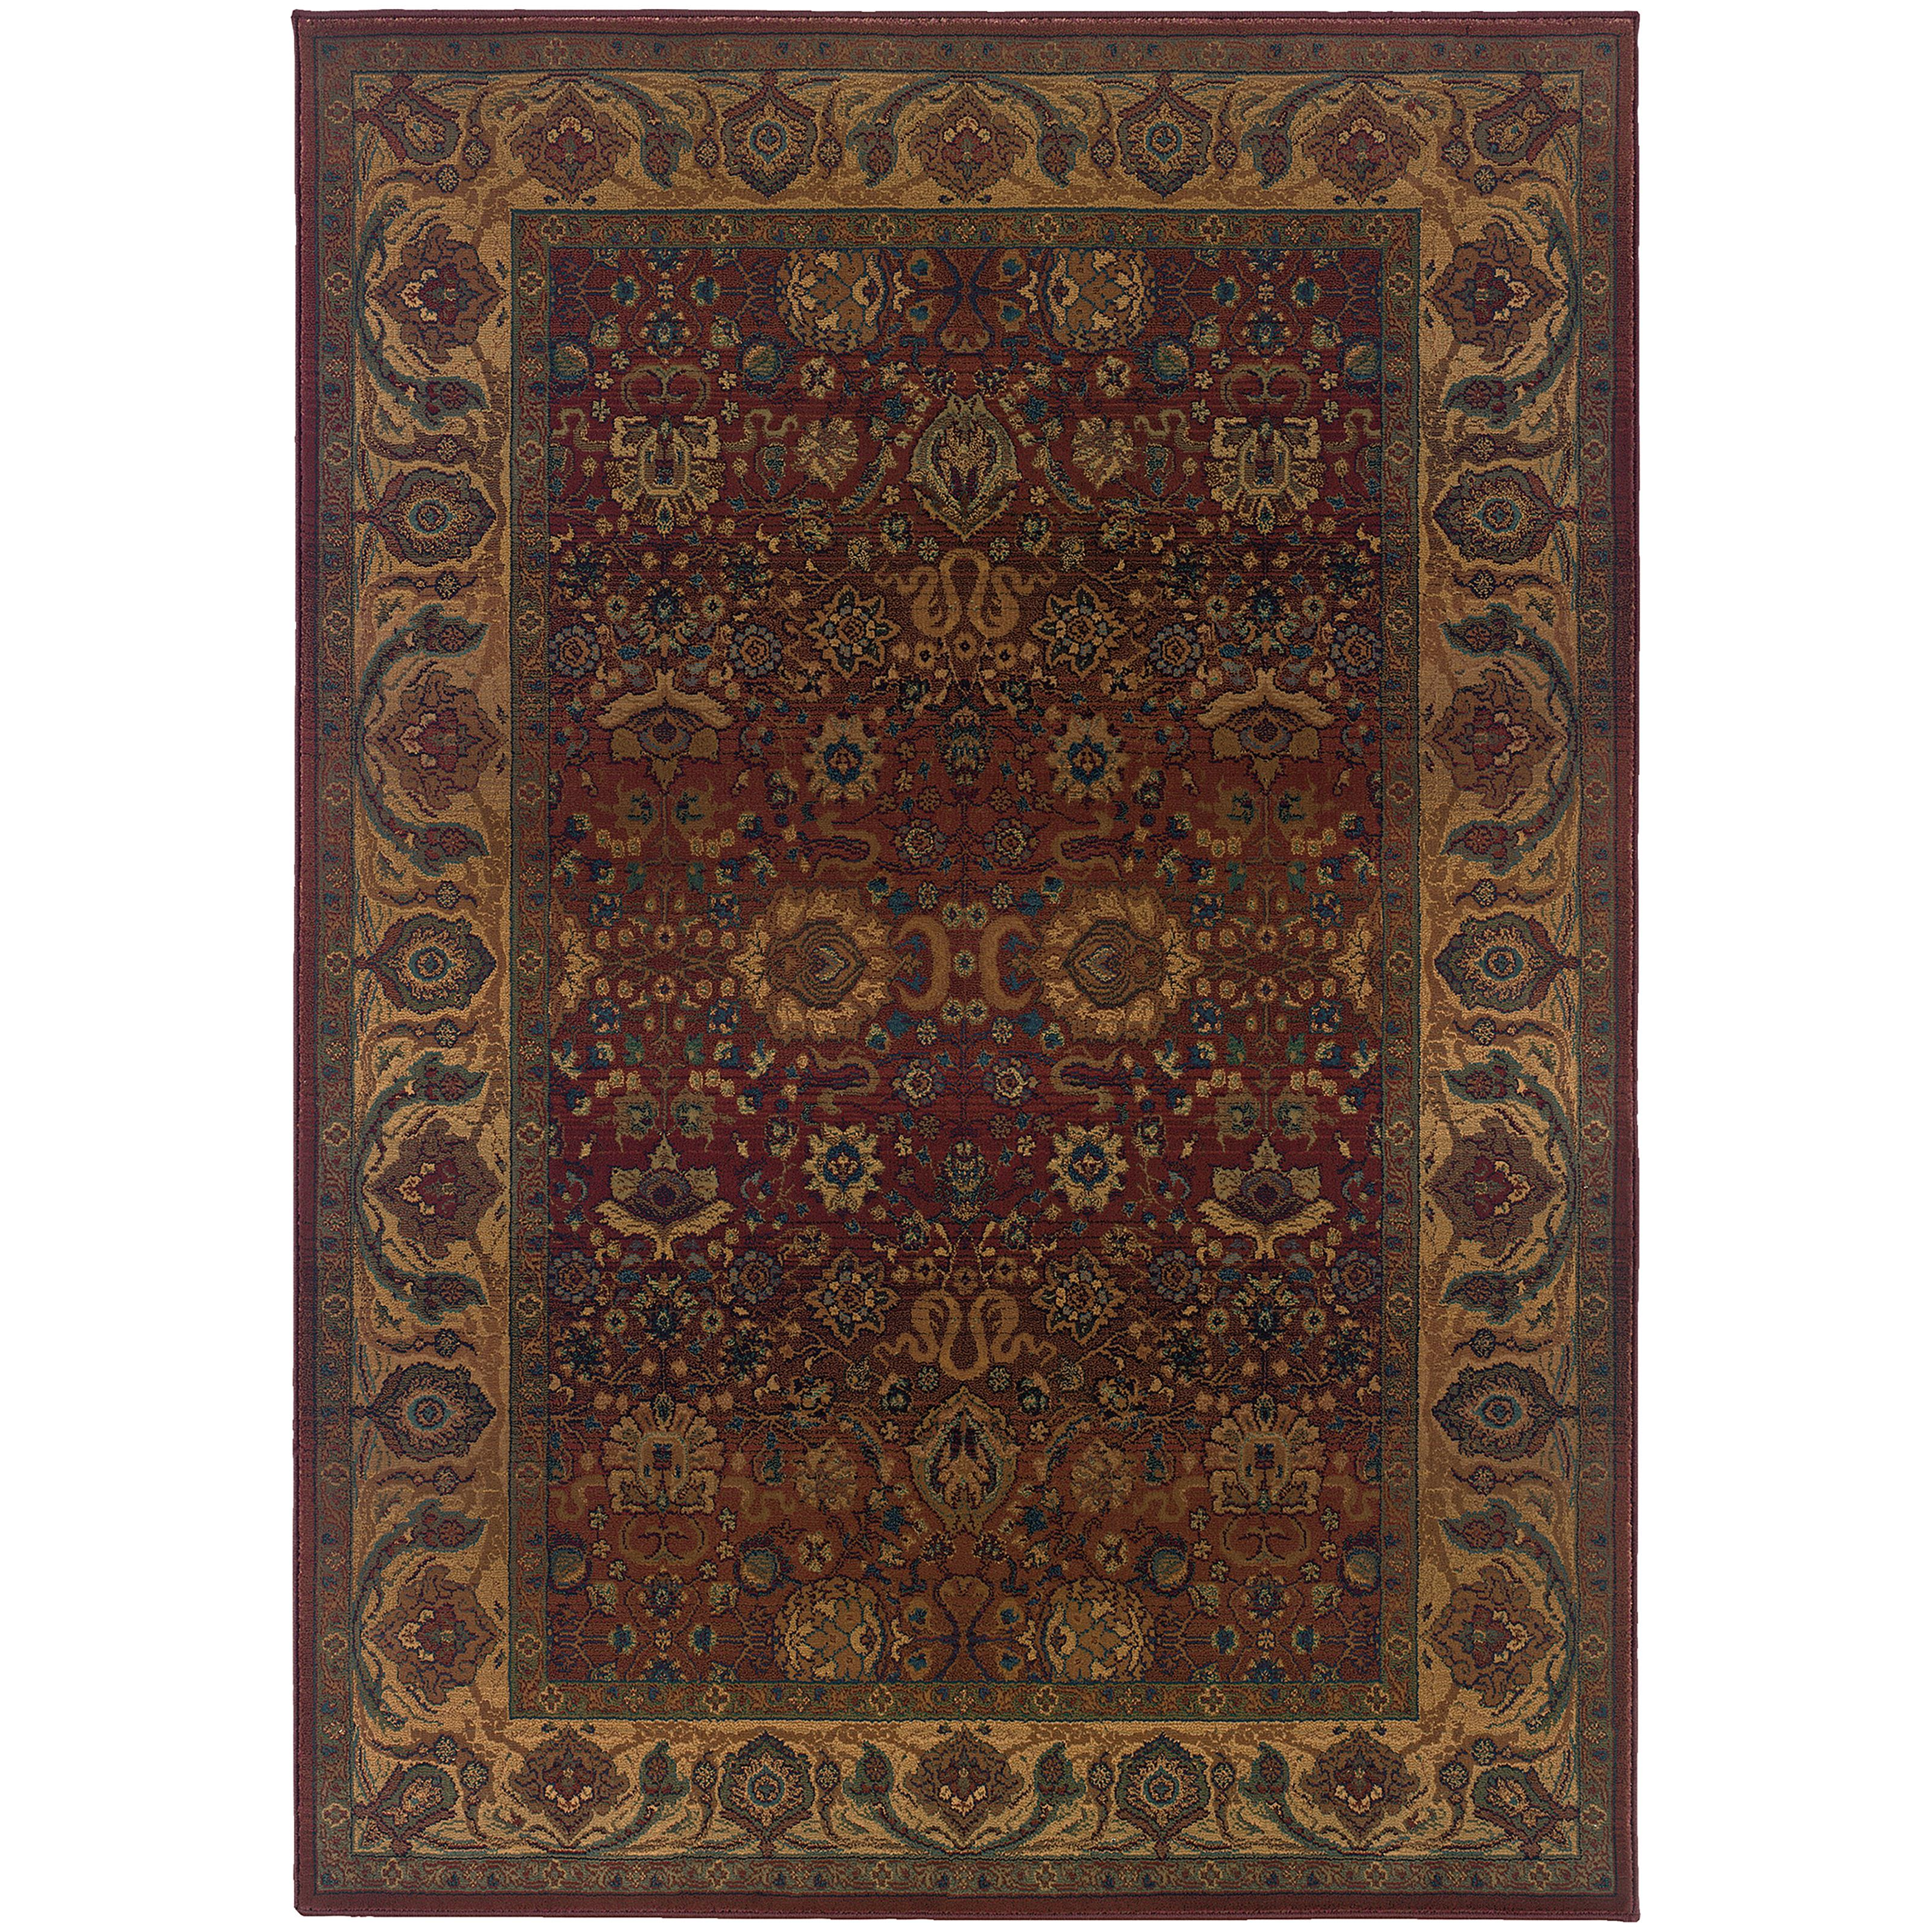 "Kharma 7'10"" X 11' Rug by Oriental Weavers at Steger's Furniture"